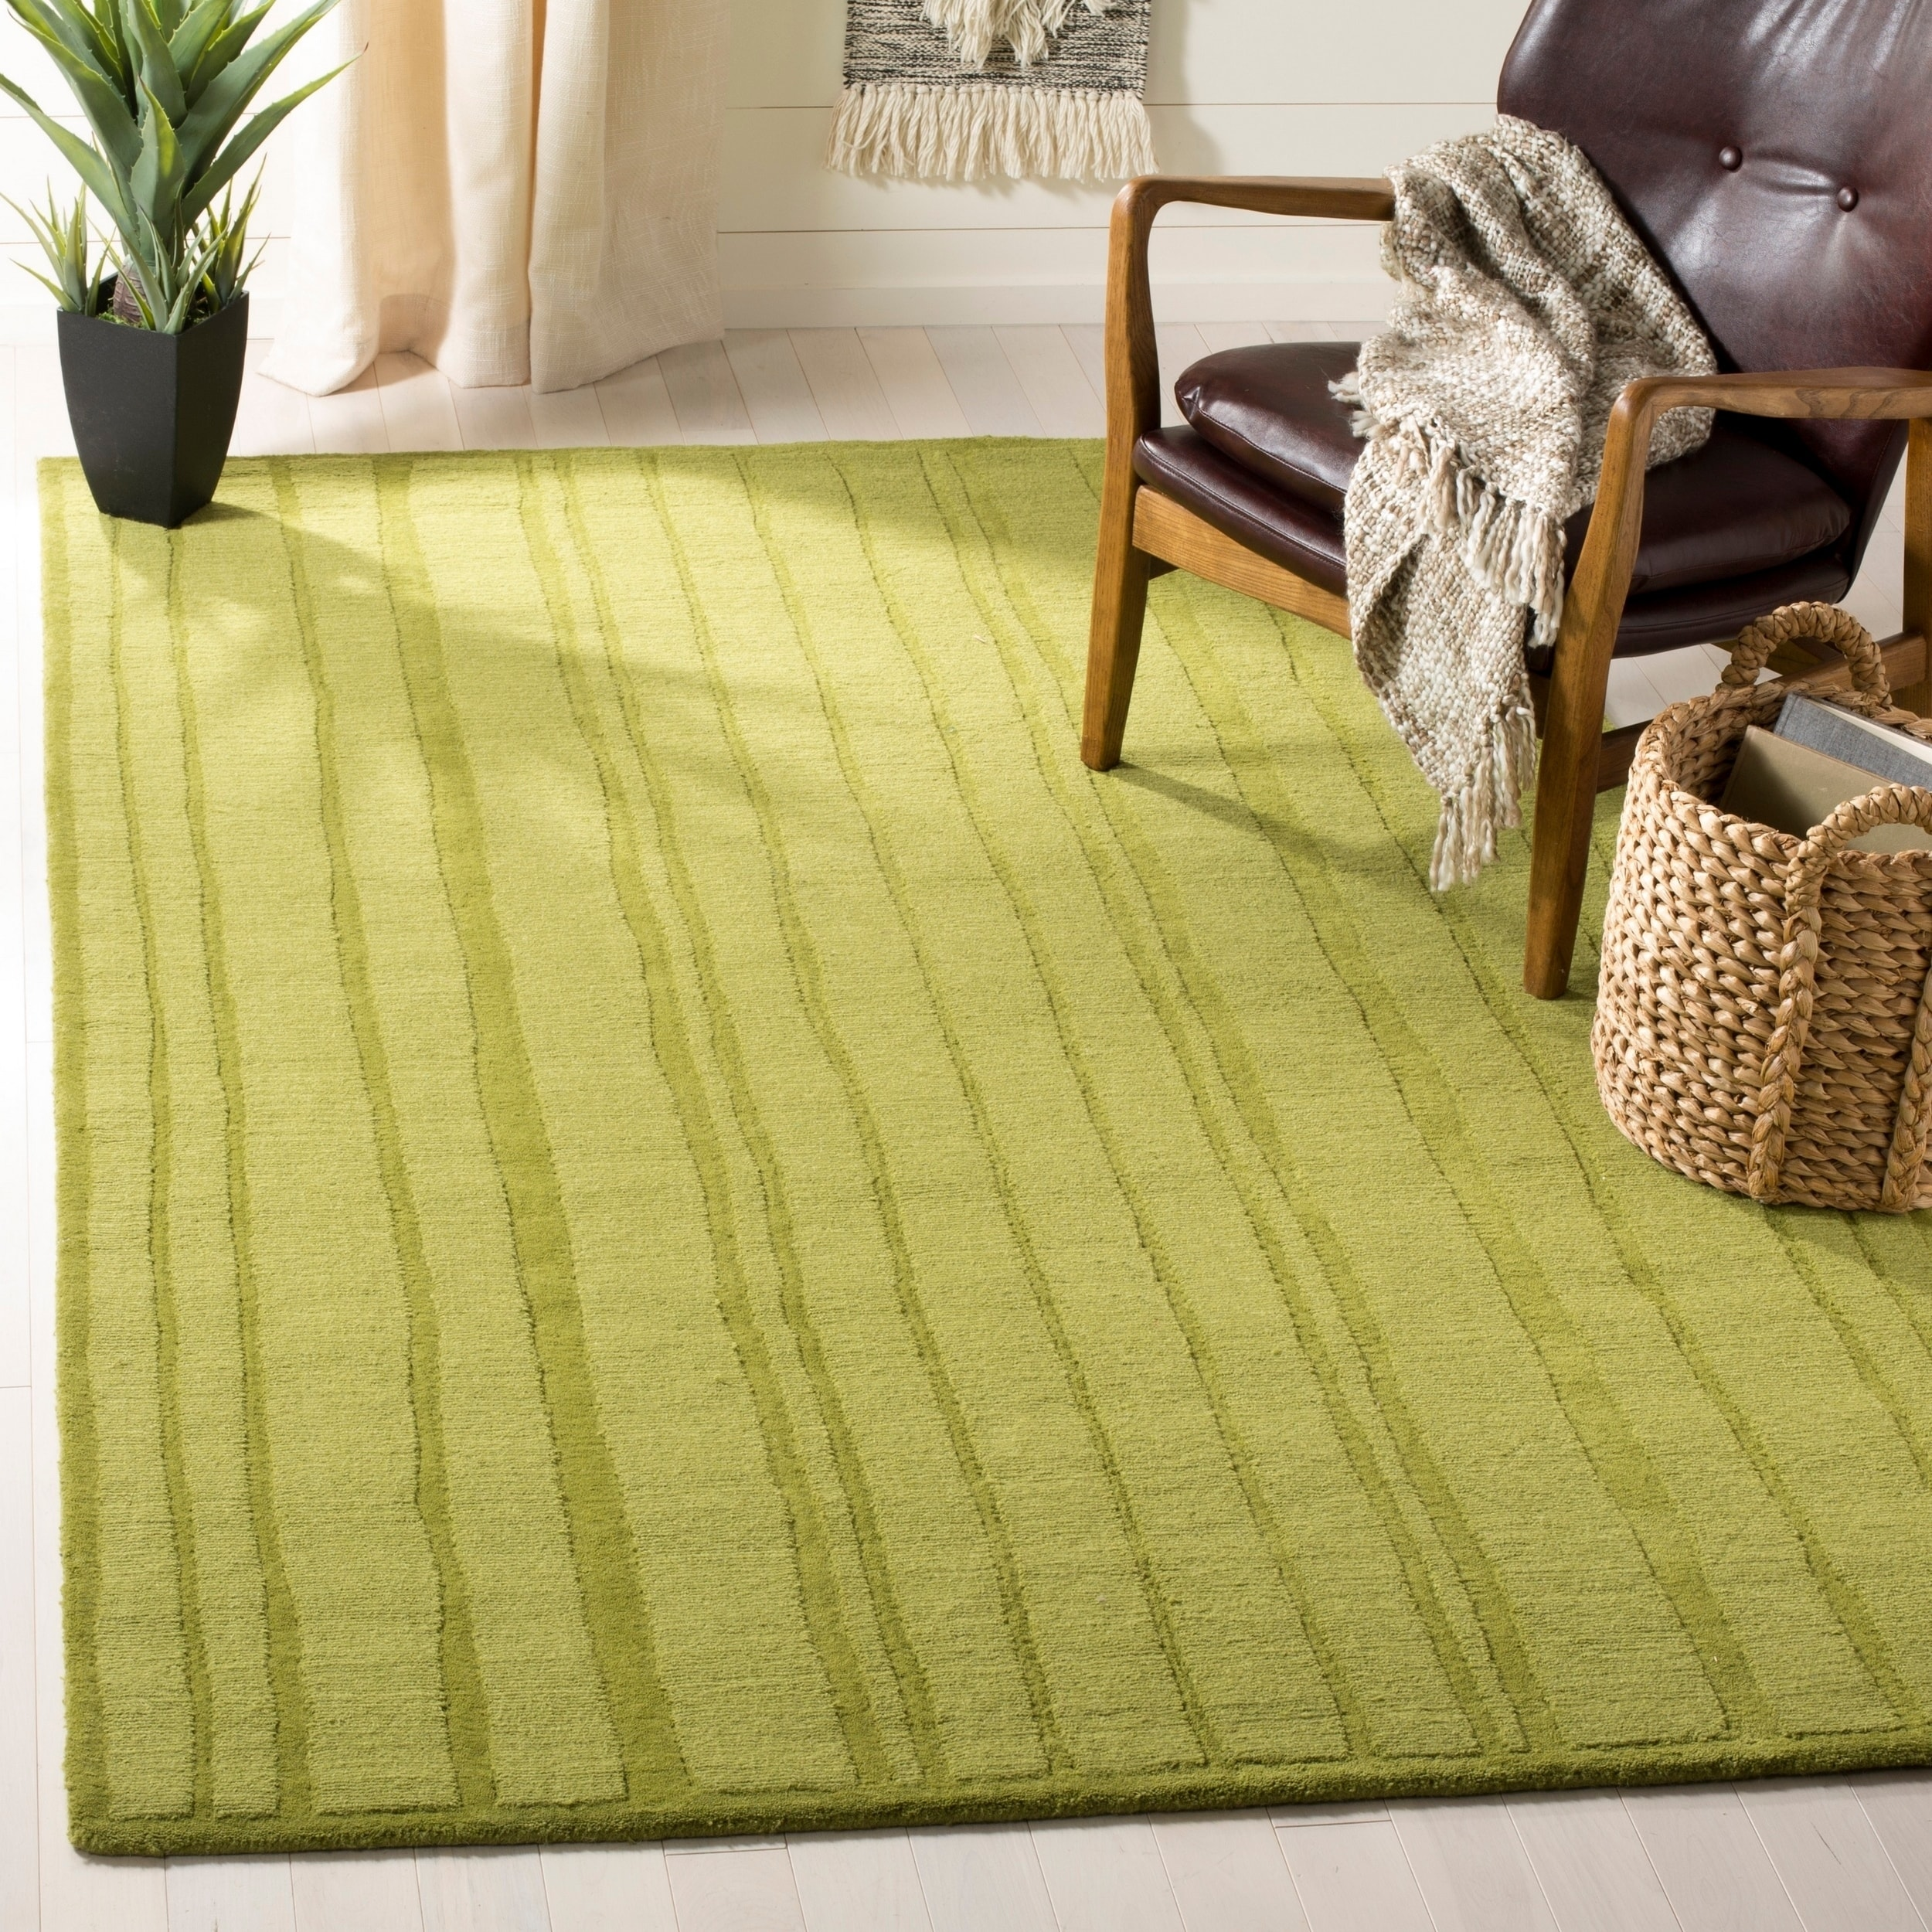 Shop Martha Stewart by Safavieh Freehand Stripe Mossy Rock / Green ...